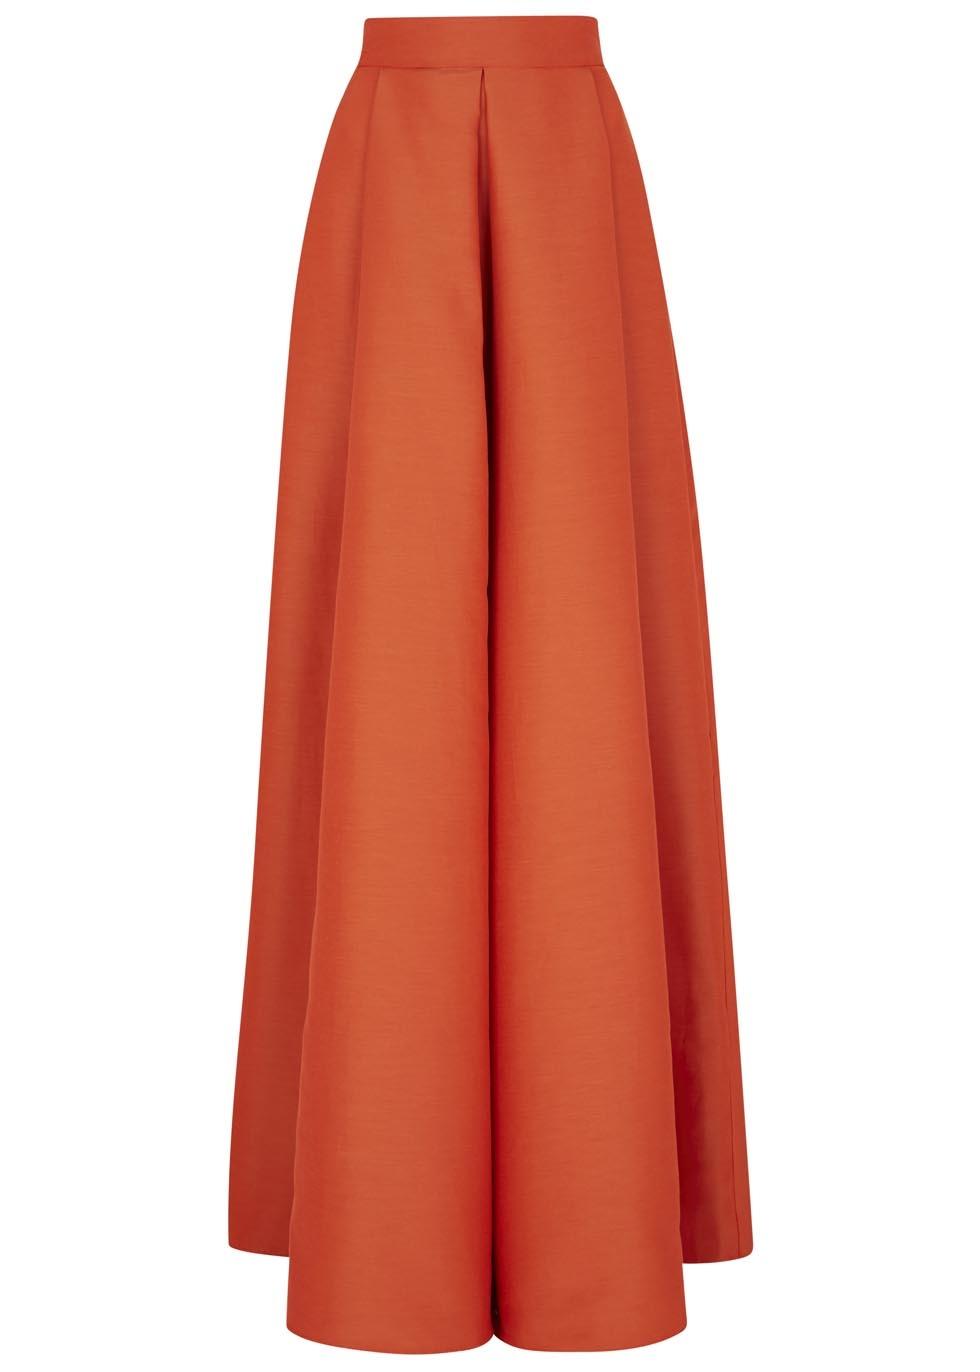 roksanda alia flared dupion maxi skirt in orange lyst